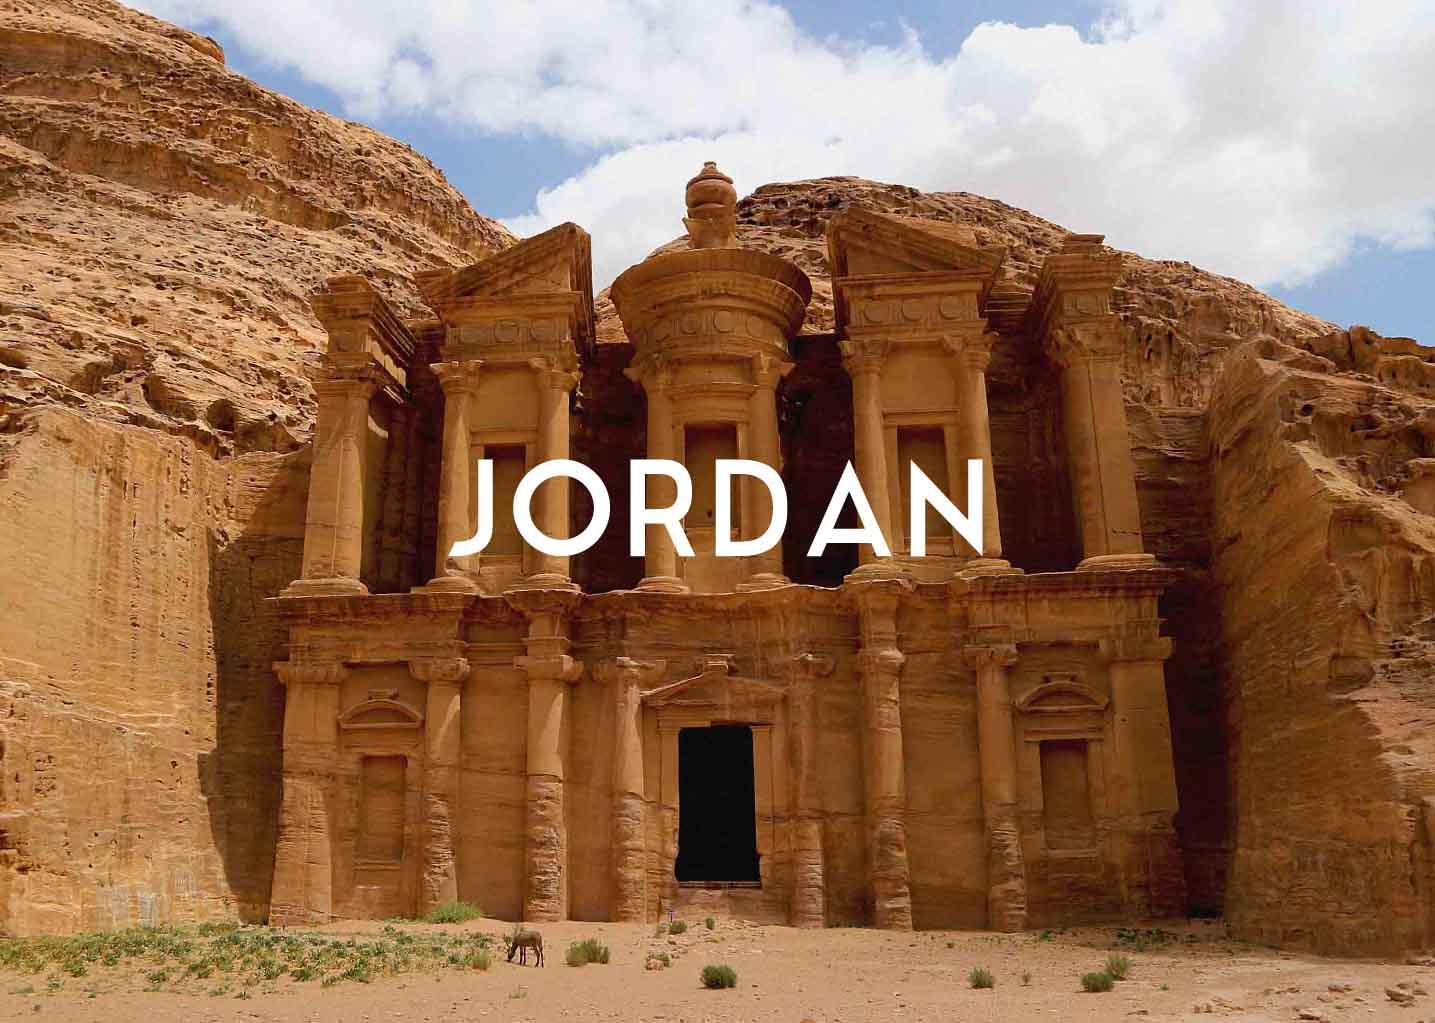 Jordan Photography Gallery